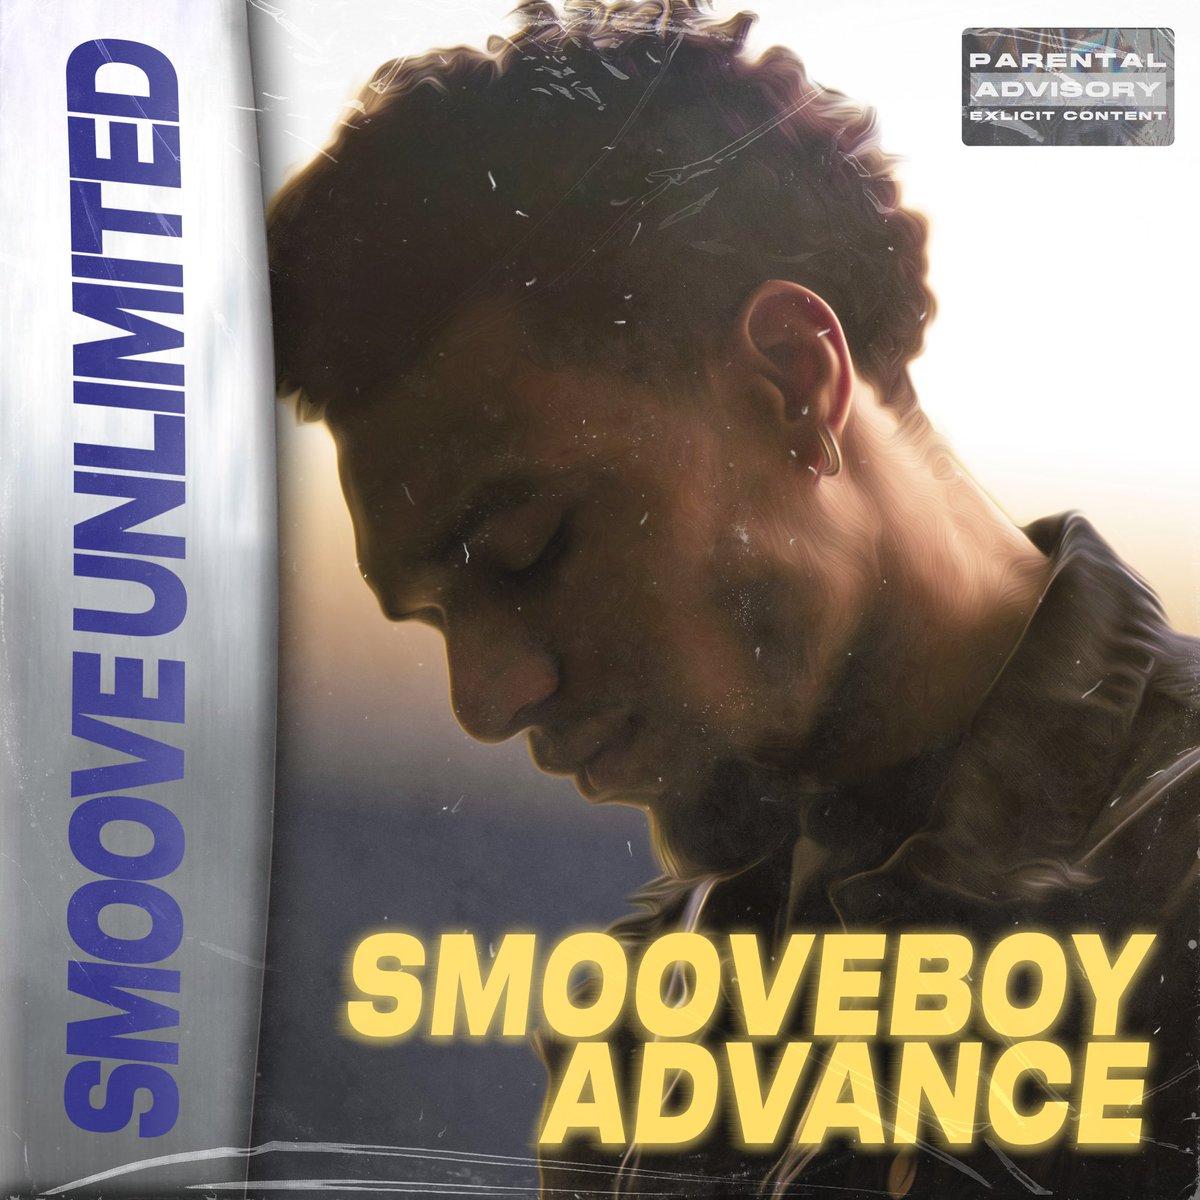 STREAM #SMOOVEBOYADVANCE TODAY ON YOUR FAV MUSIC APP ampl.ink/4xrBk